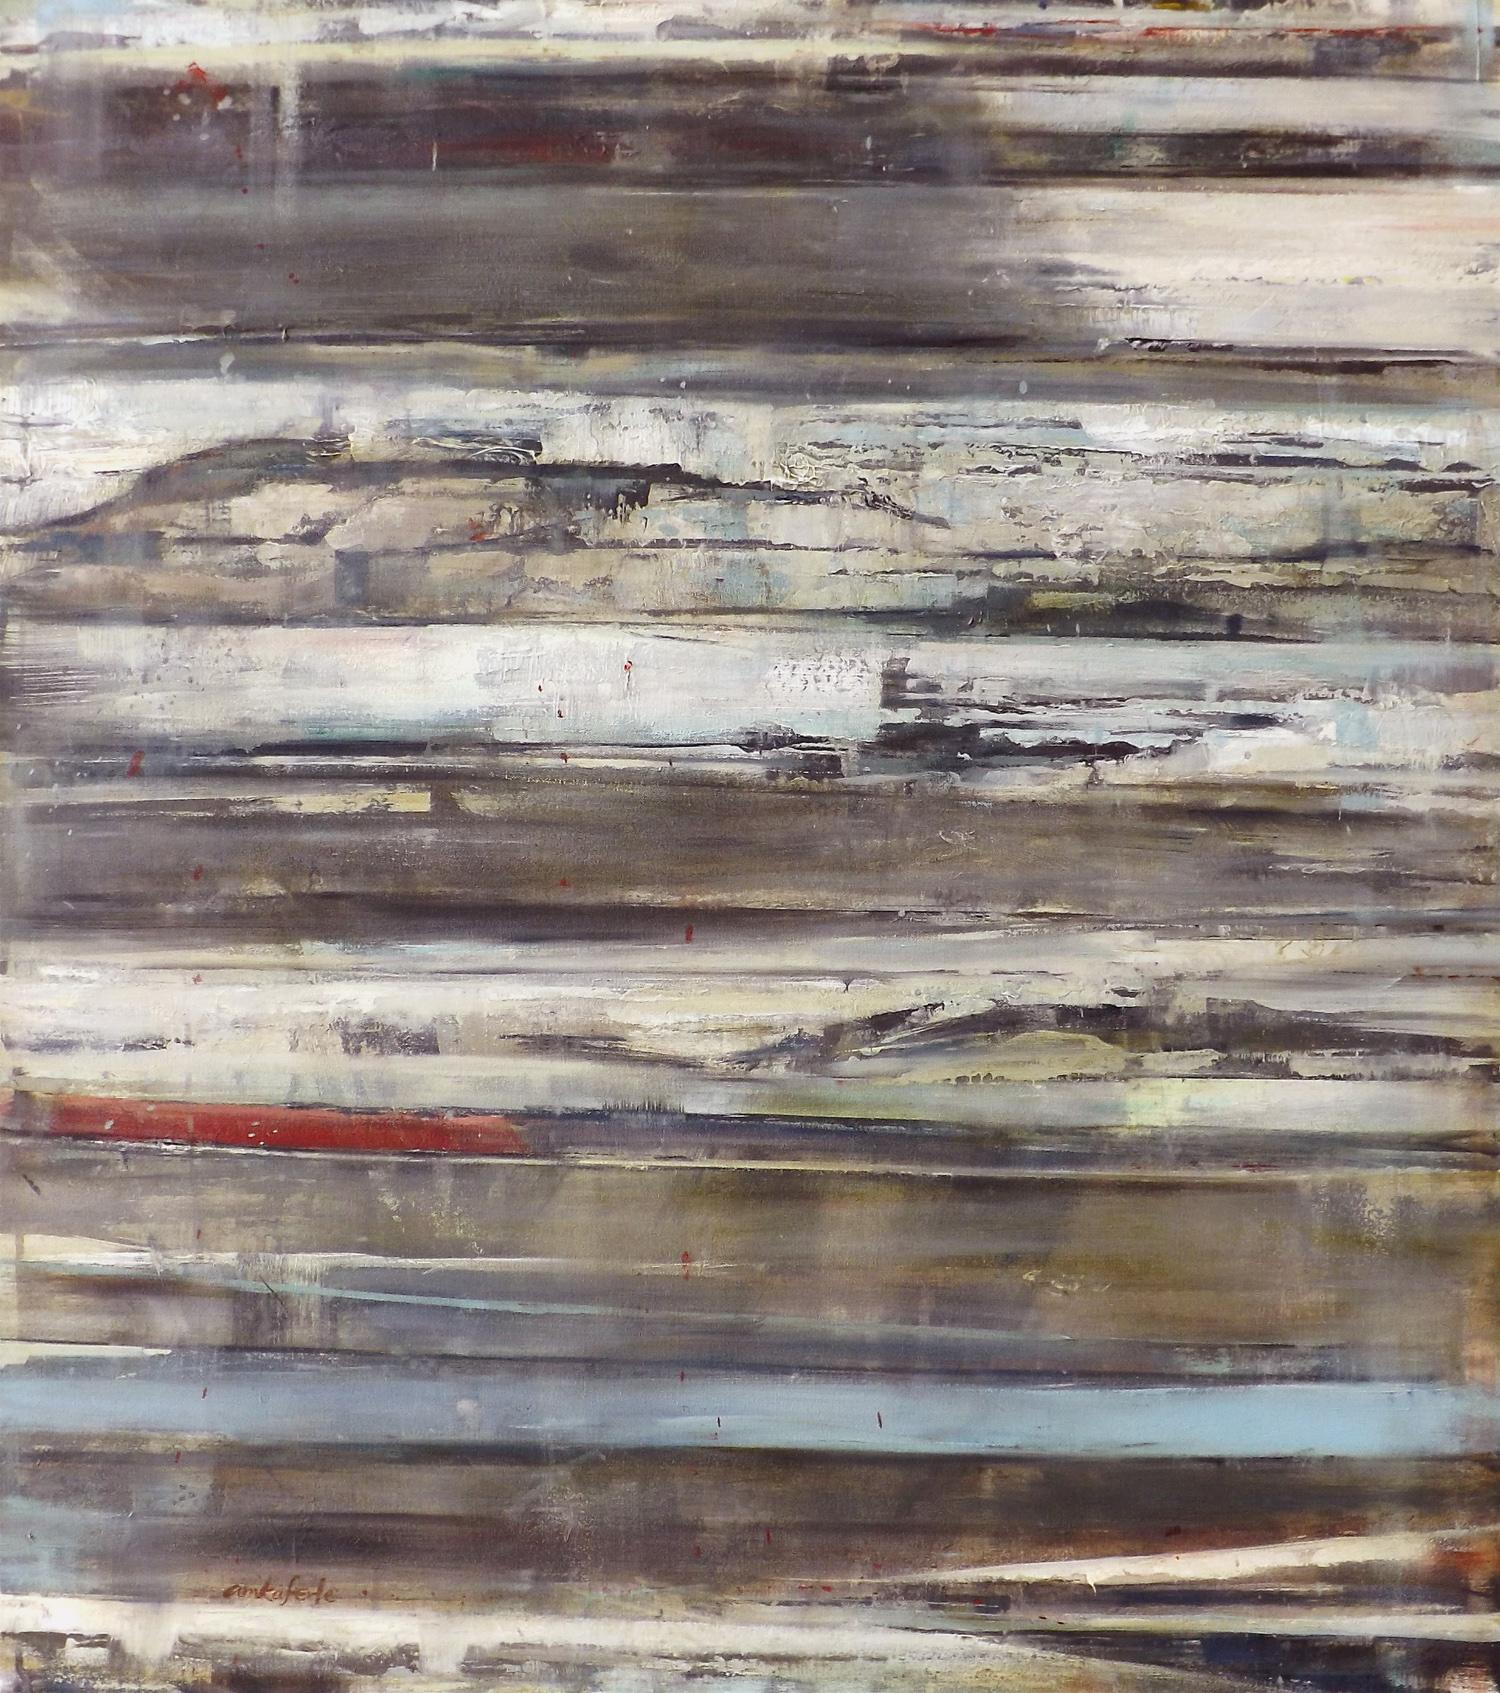 "Forum    oil on canvas  36 x 32""  2013"